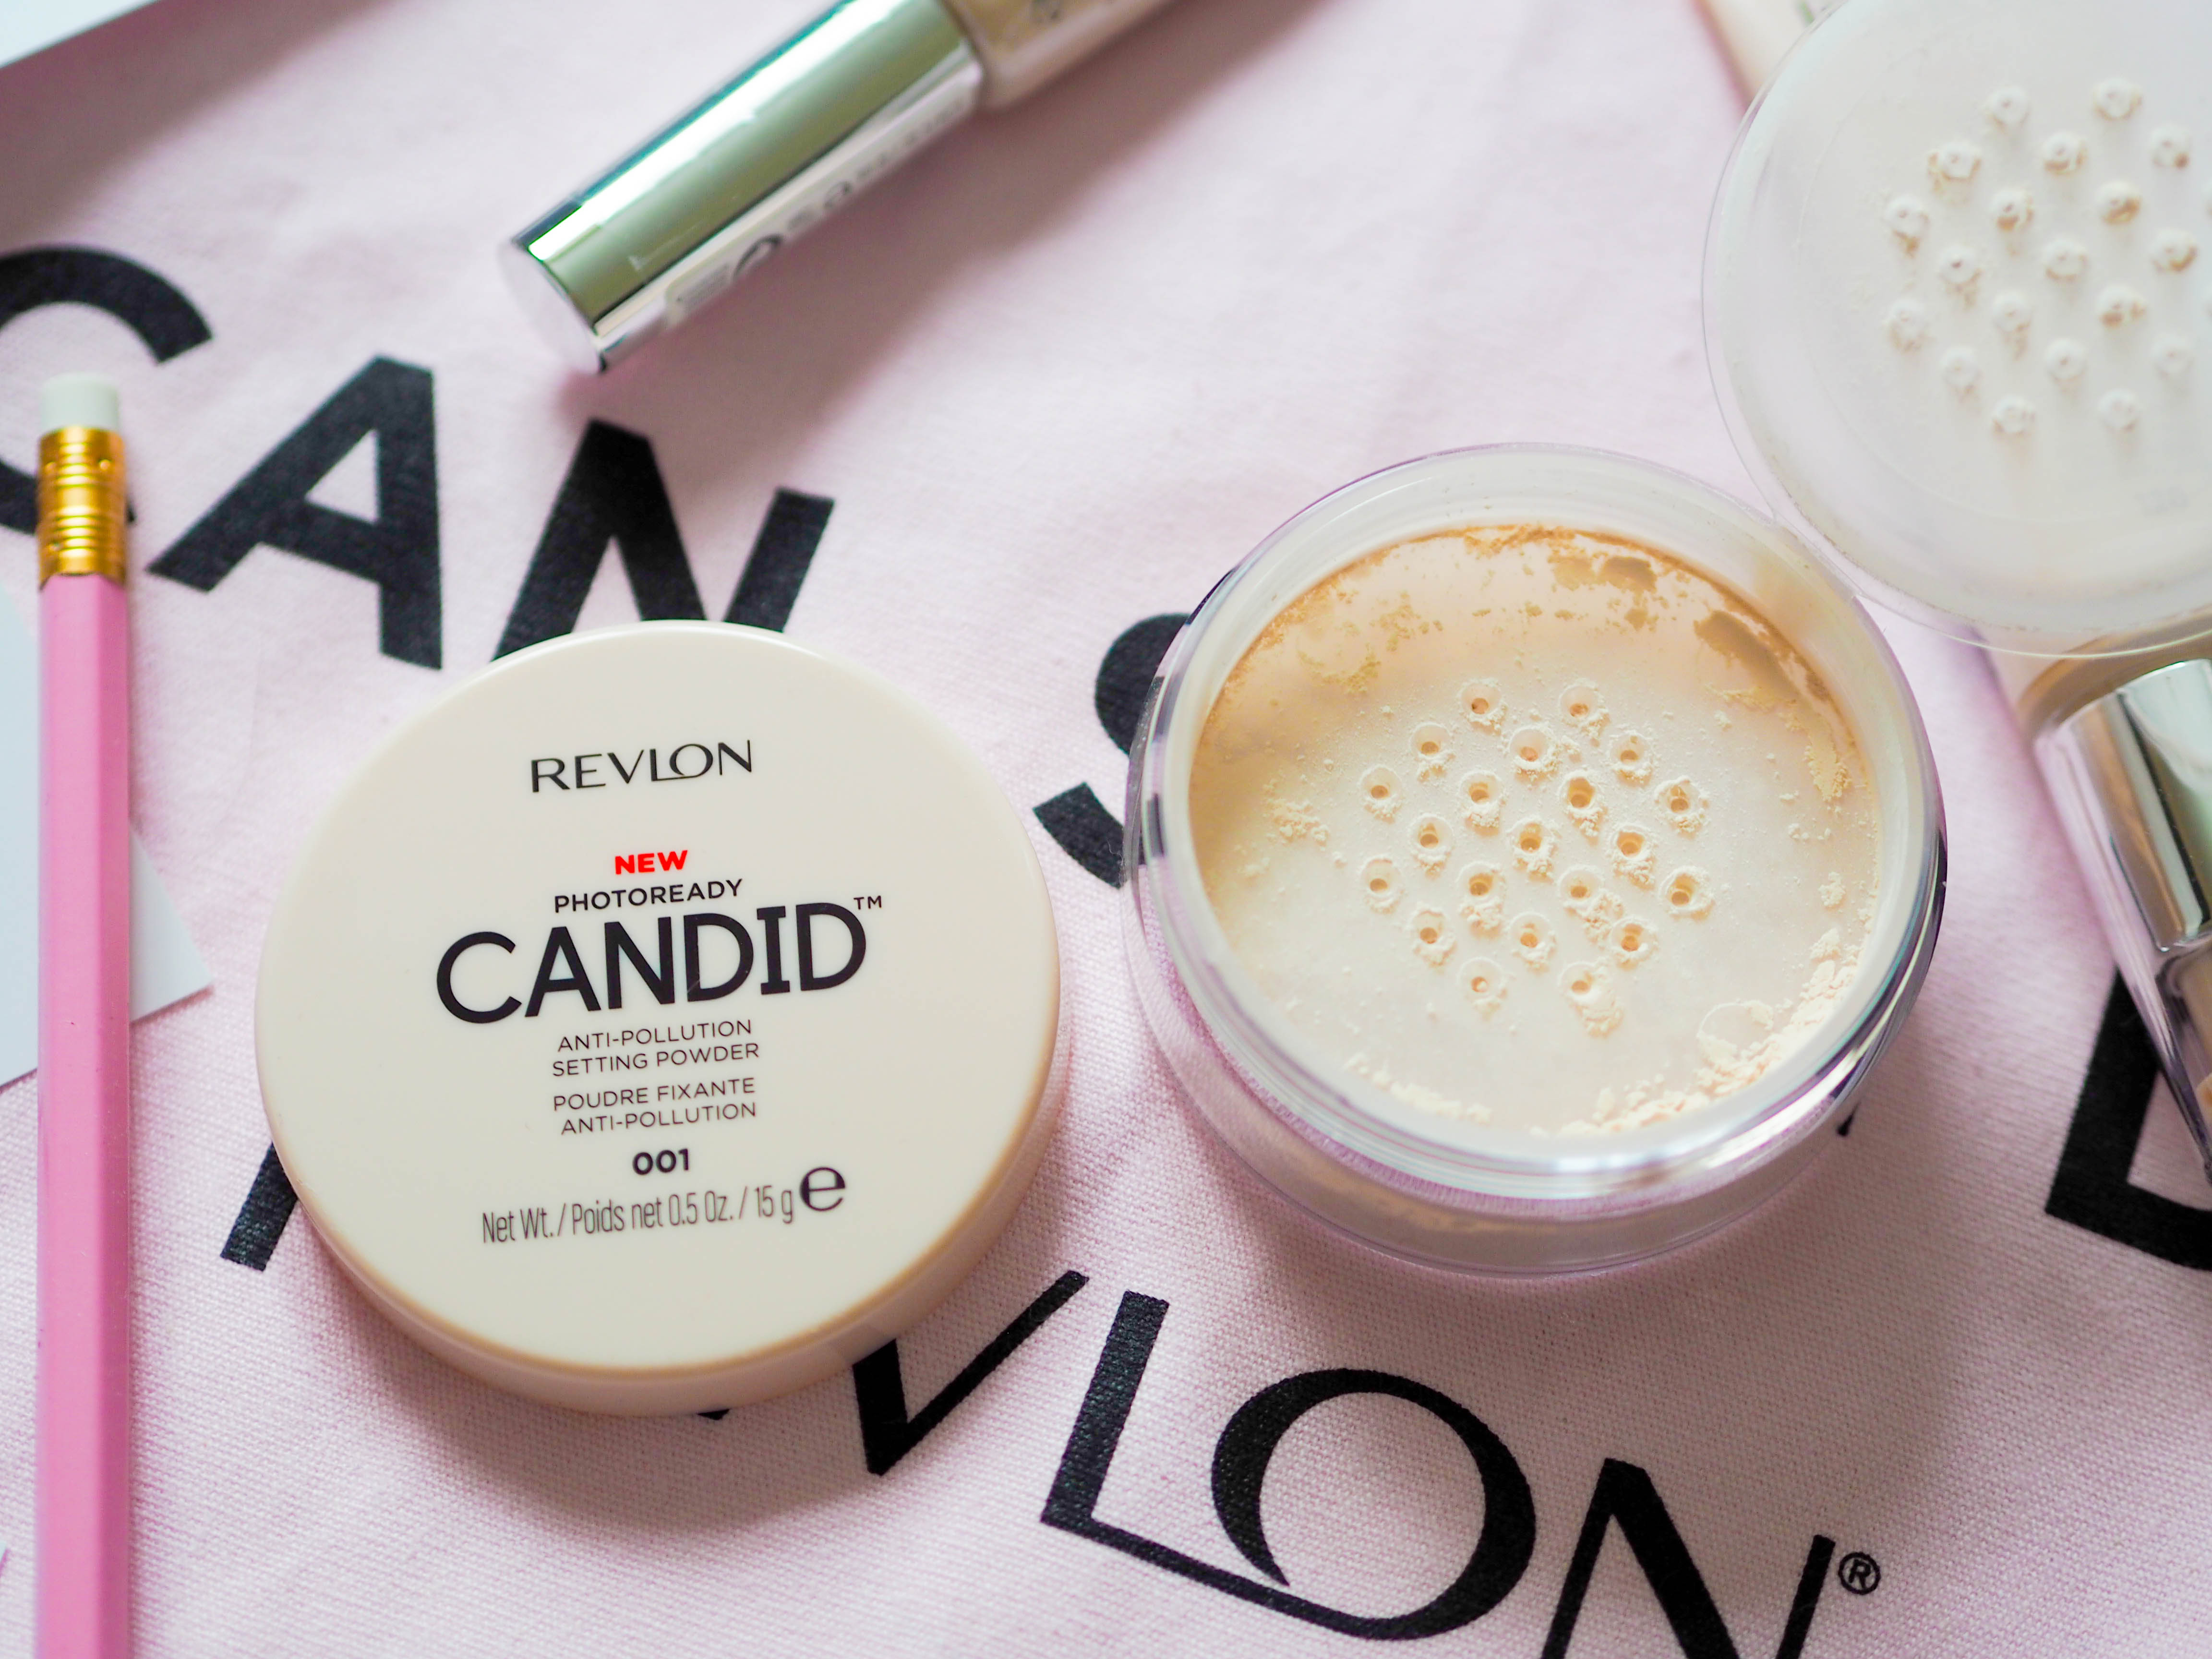 Revlon Photoready Candid Powder